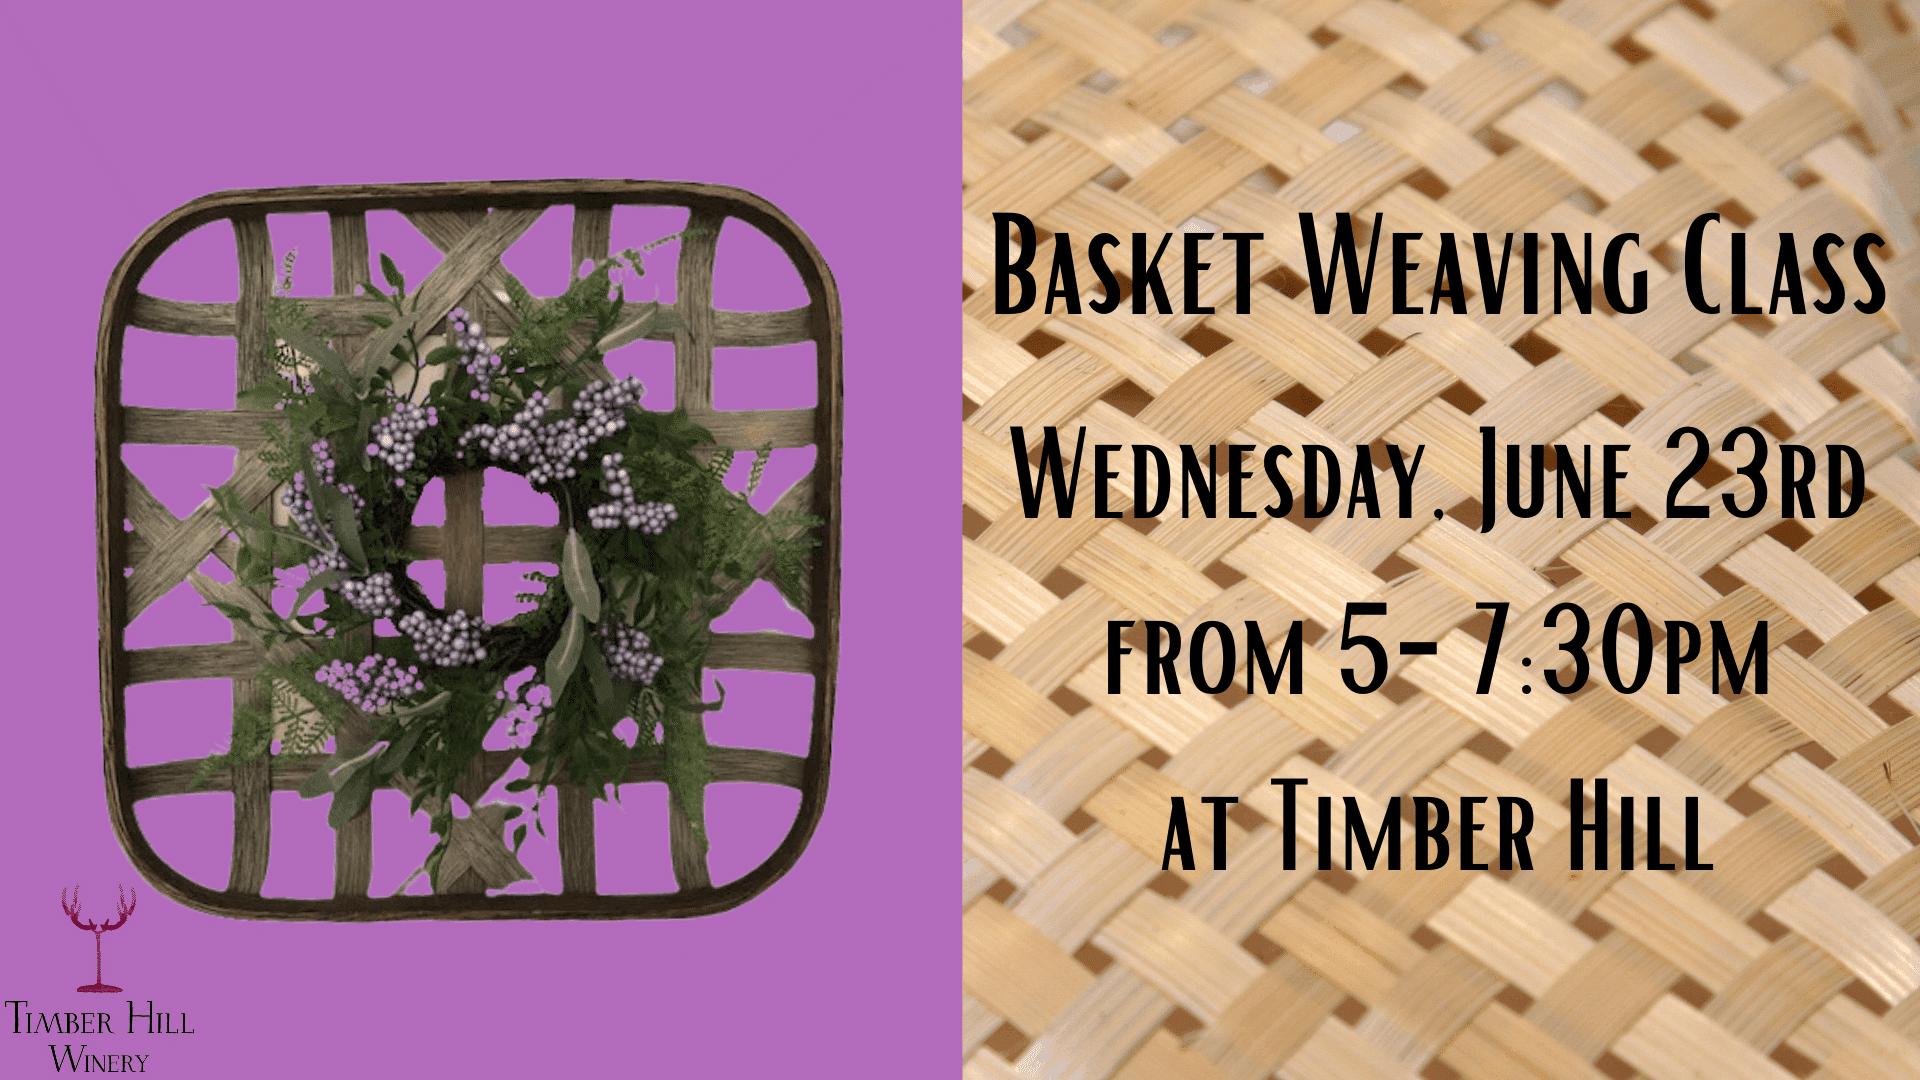 Basket Weaving Class